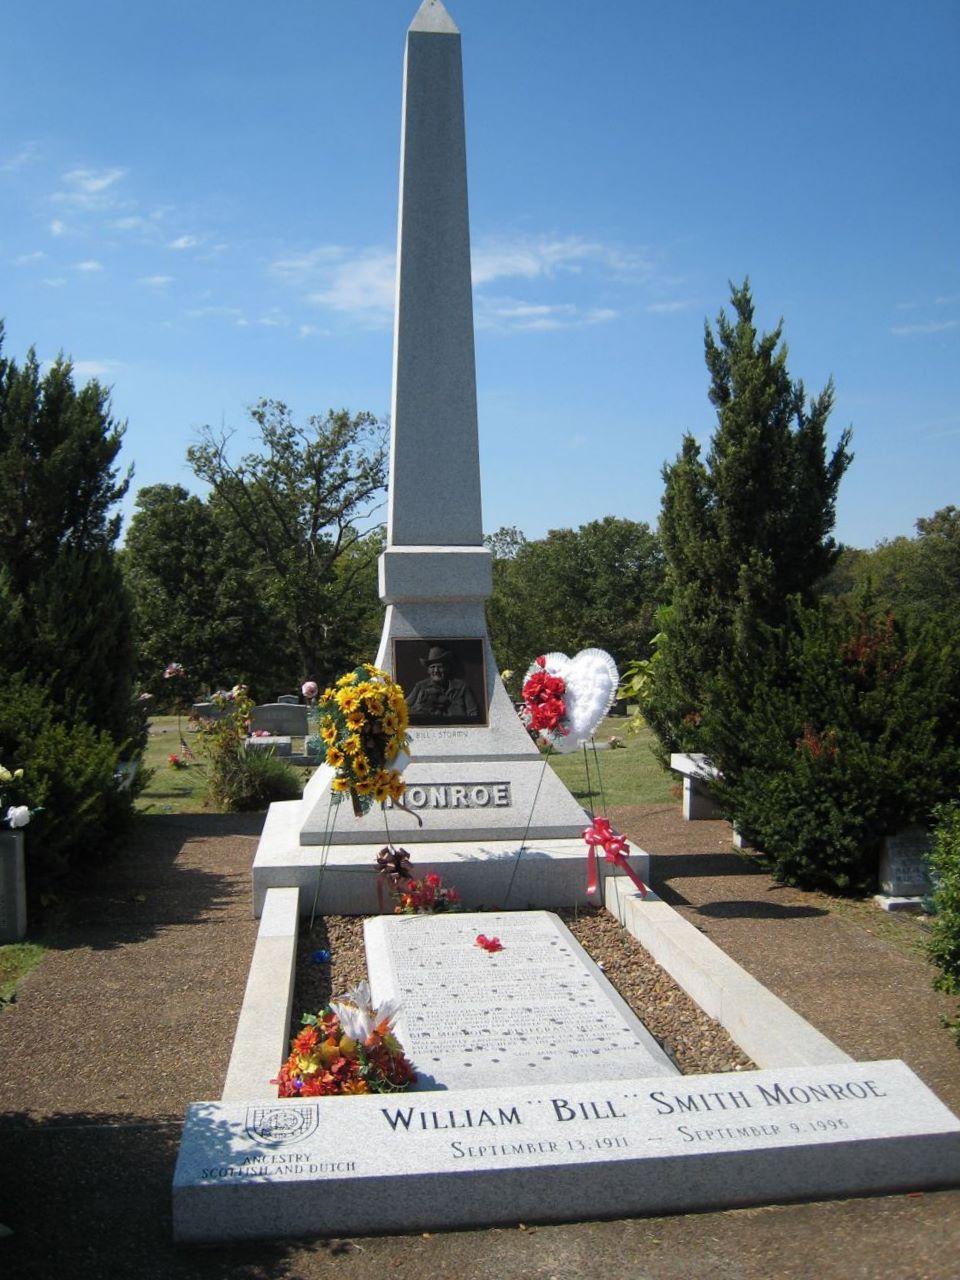 Monroe monument -